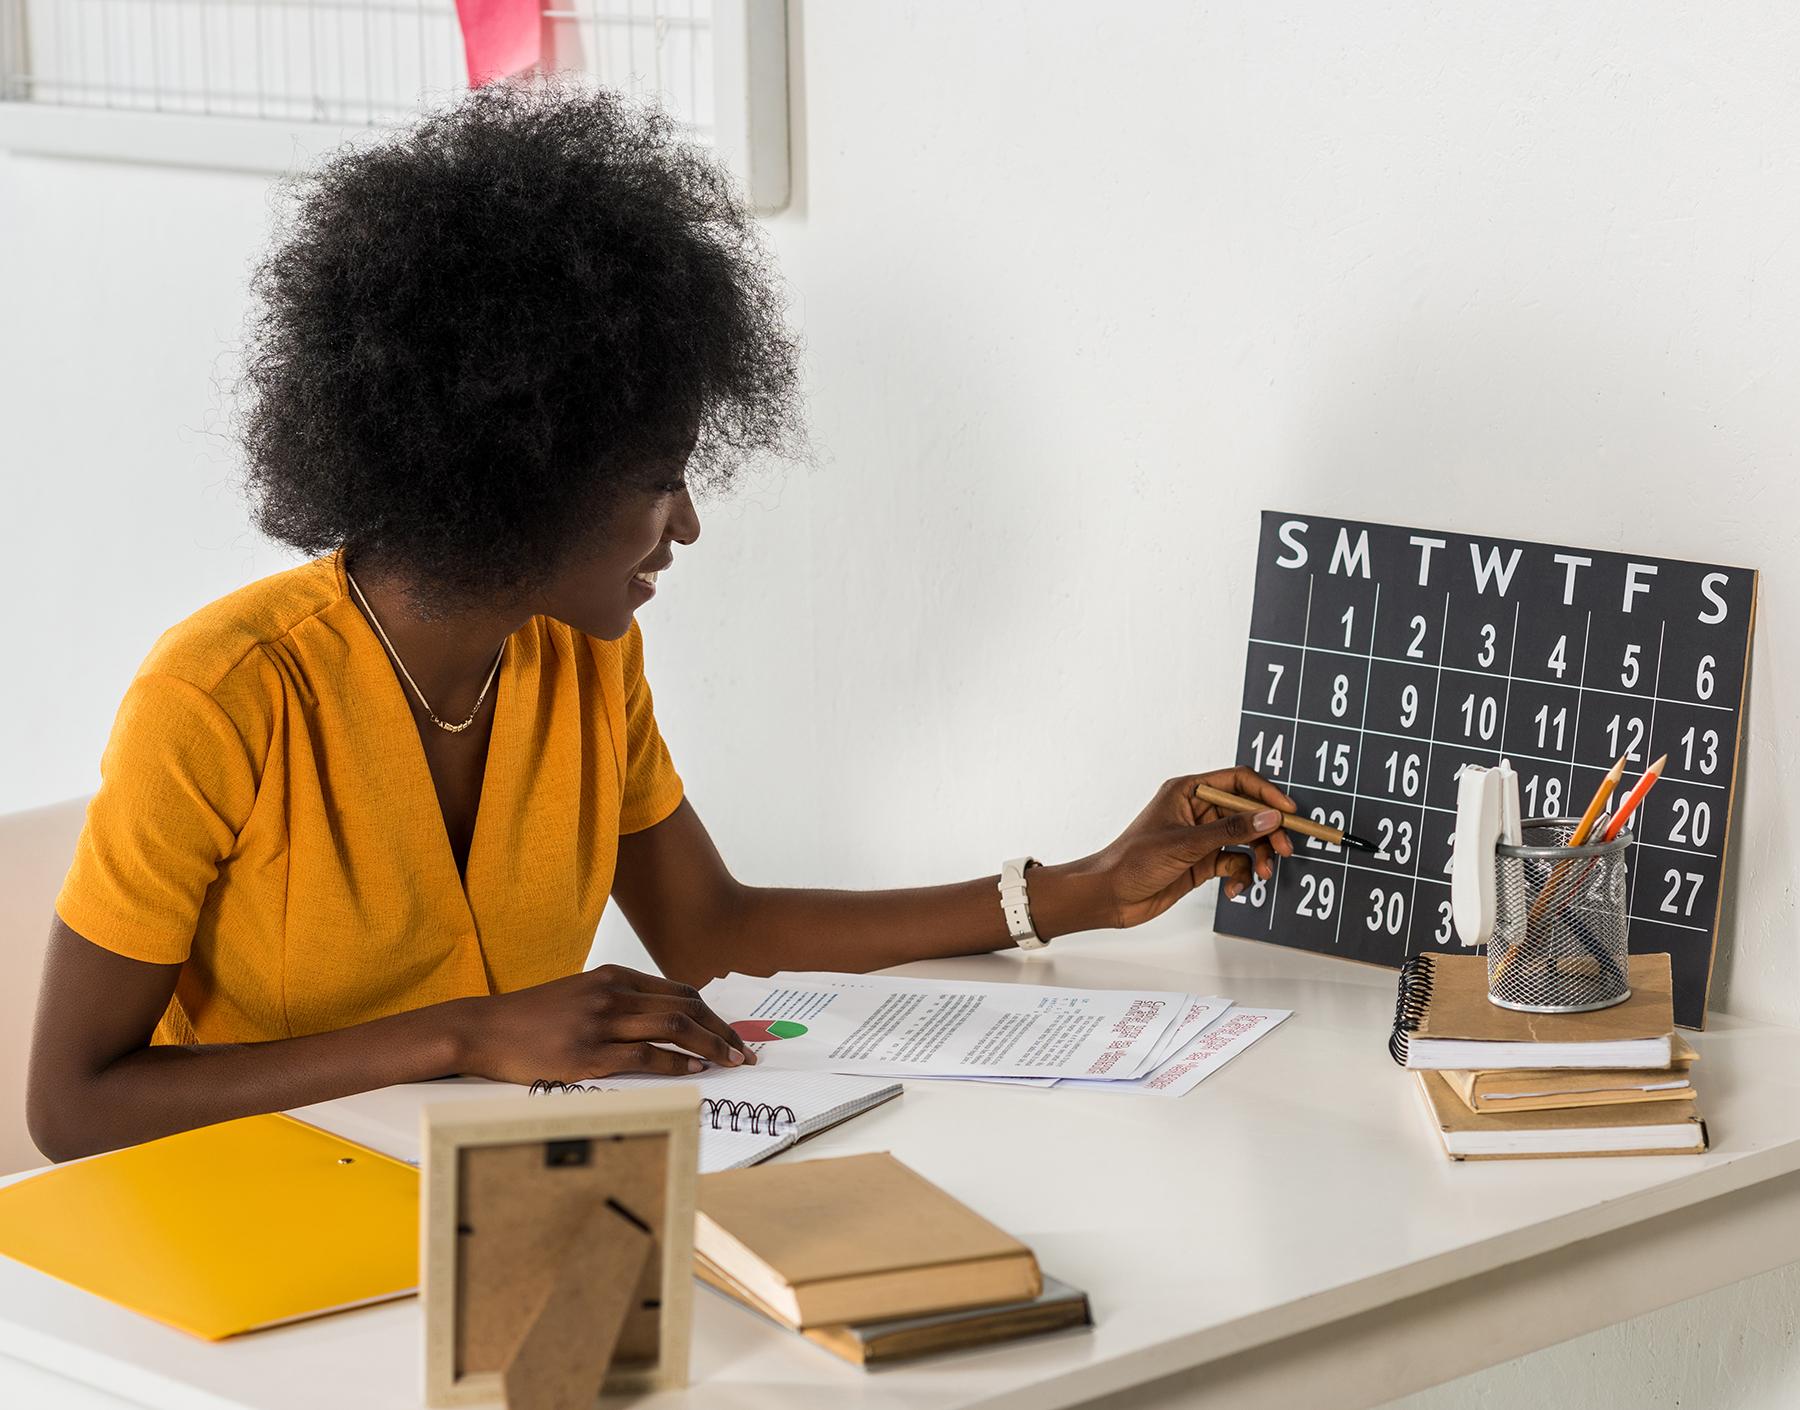 Ucsb 2022 2023 Calendar.Workforce Administration Human Resources